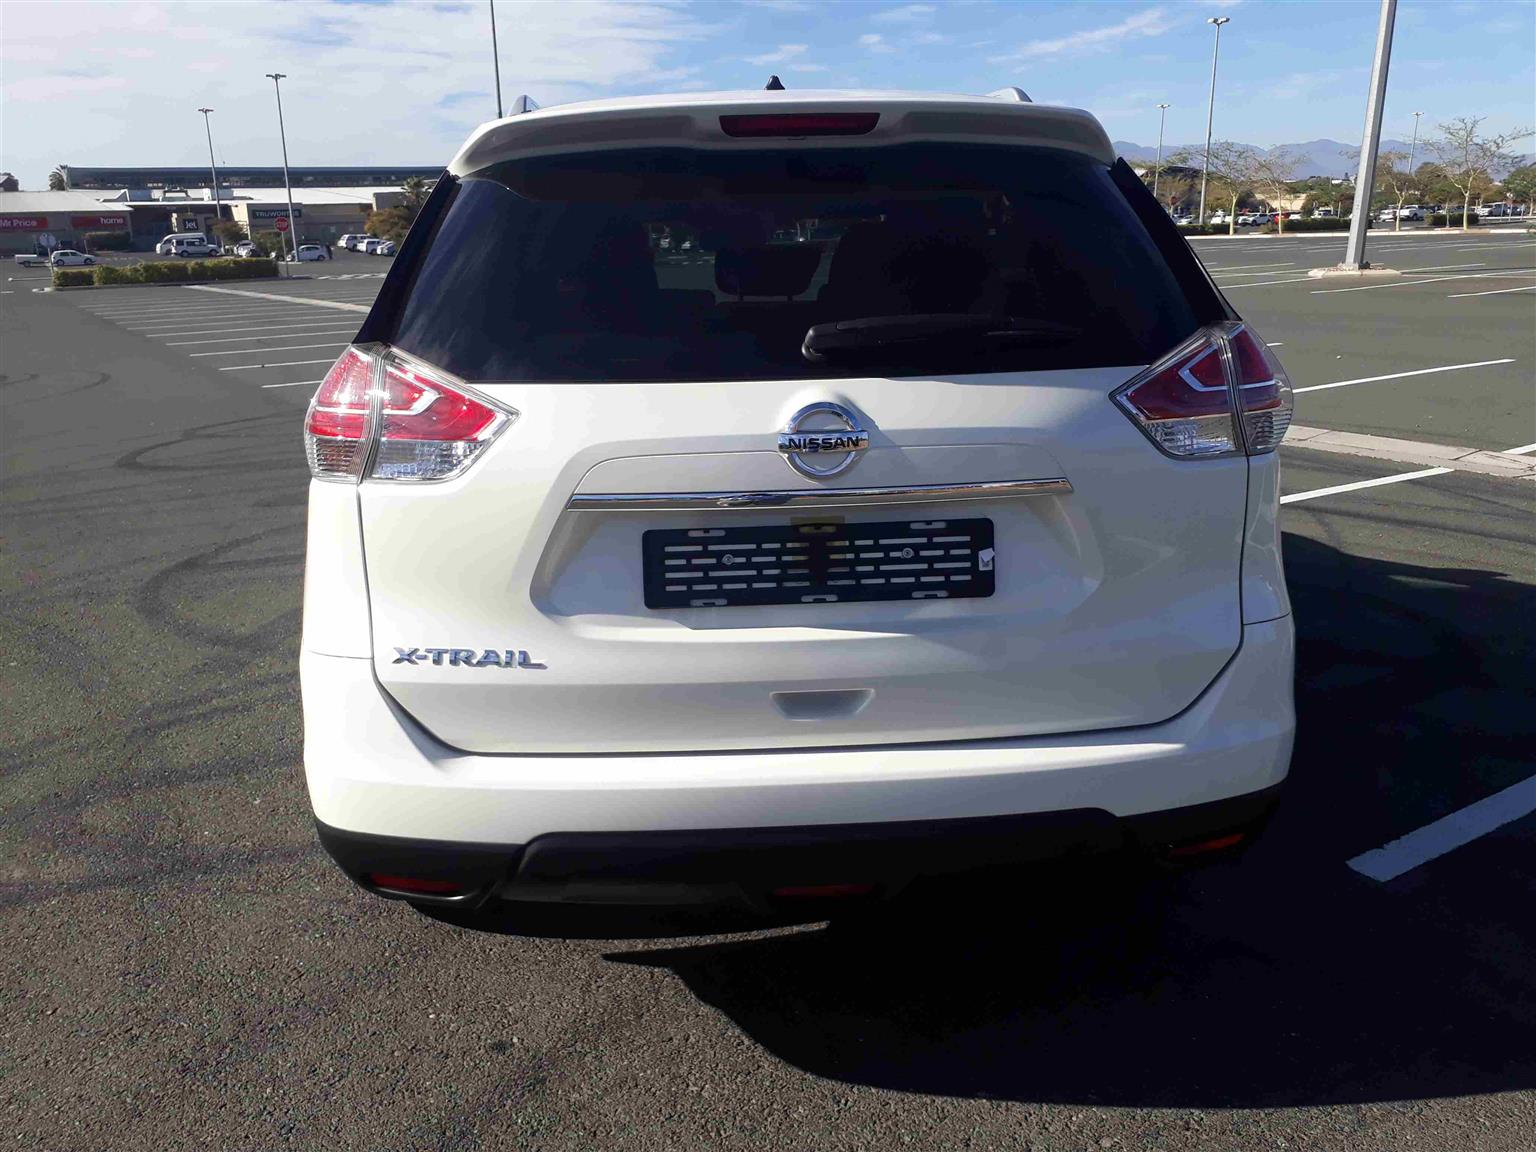 2016 Nissan X-Trail 2.5 4x4 SE CVT